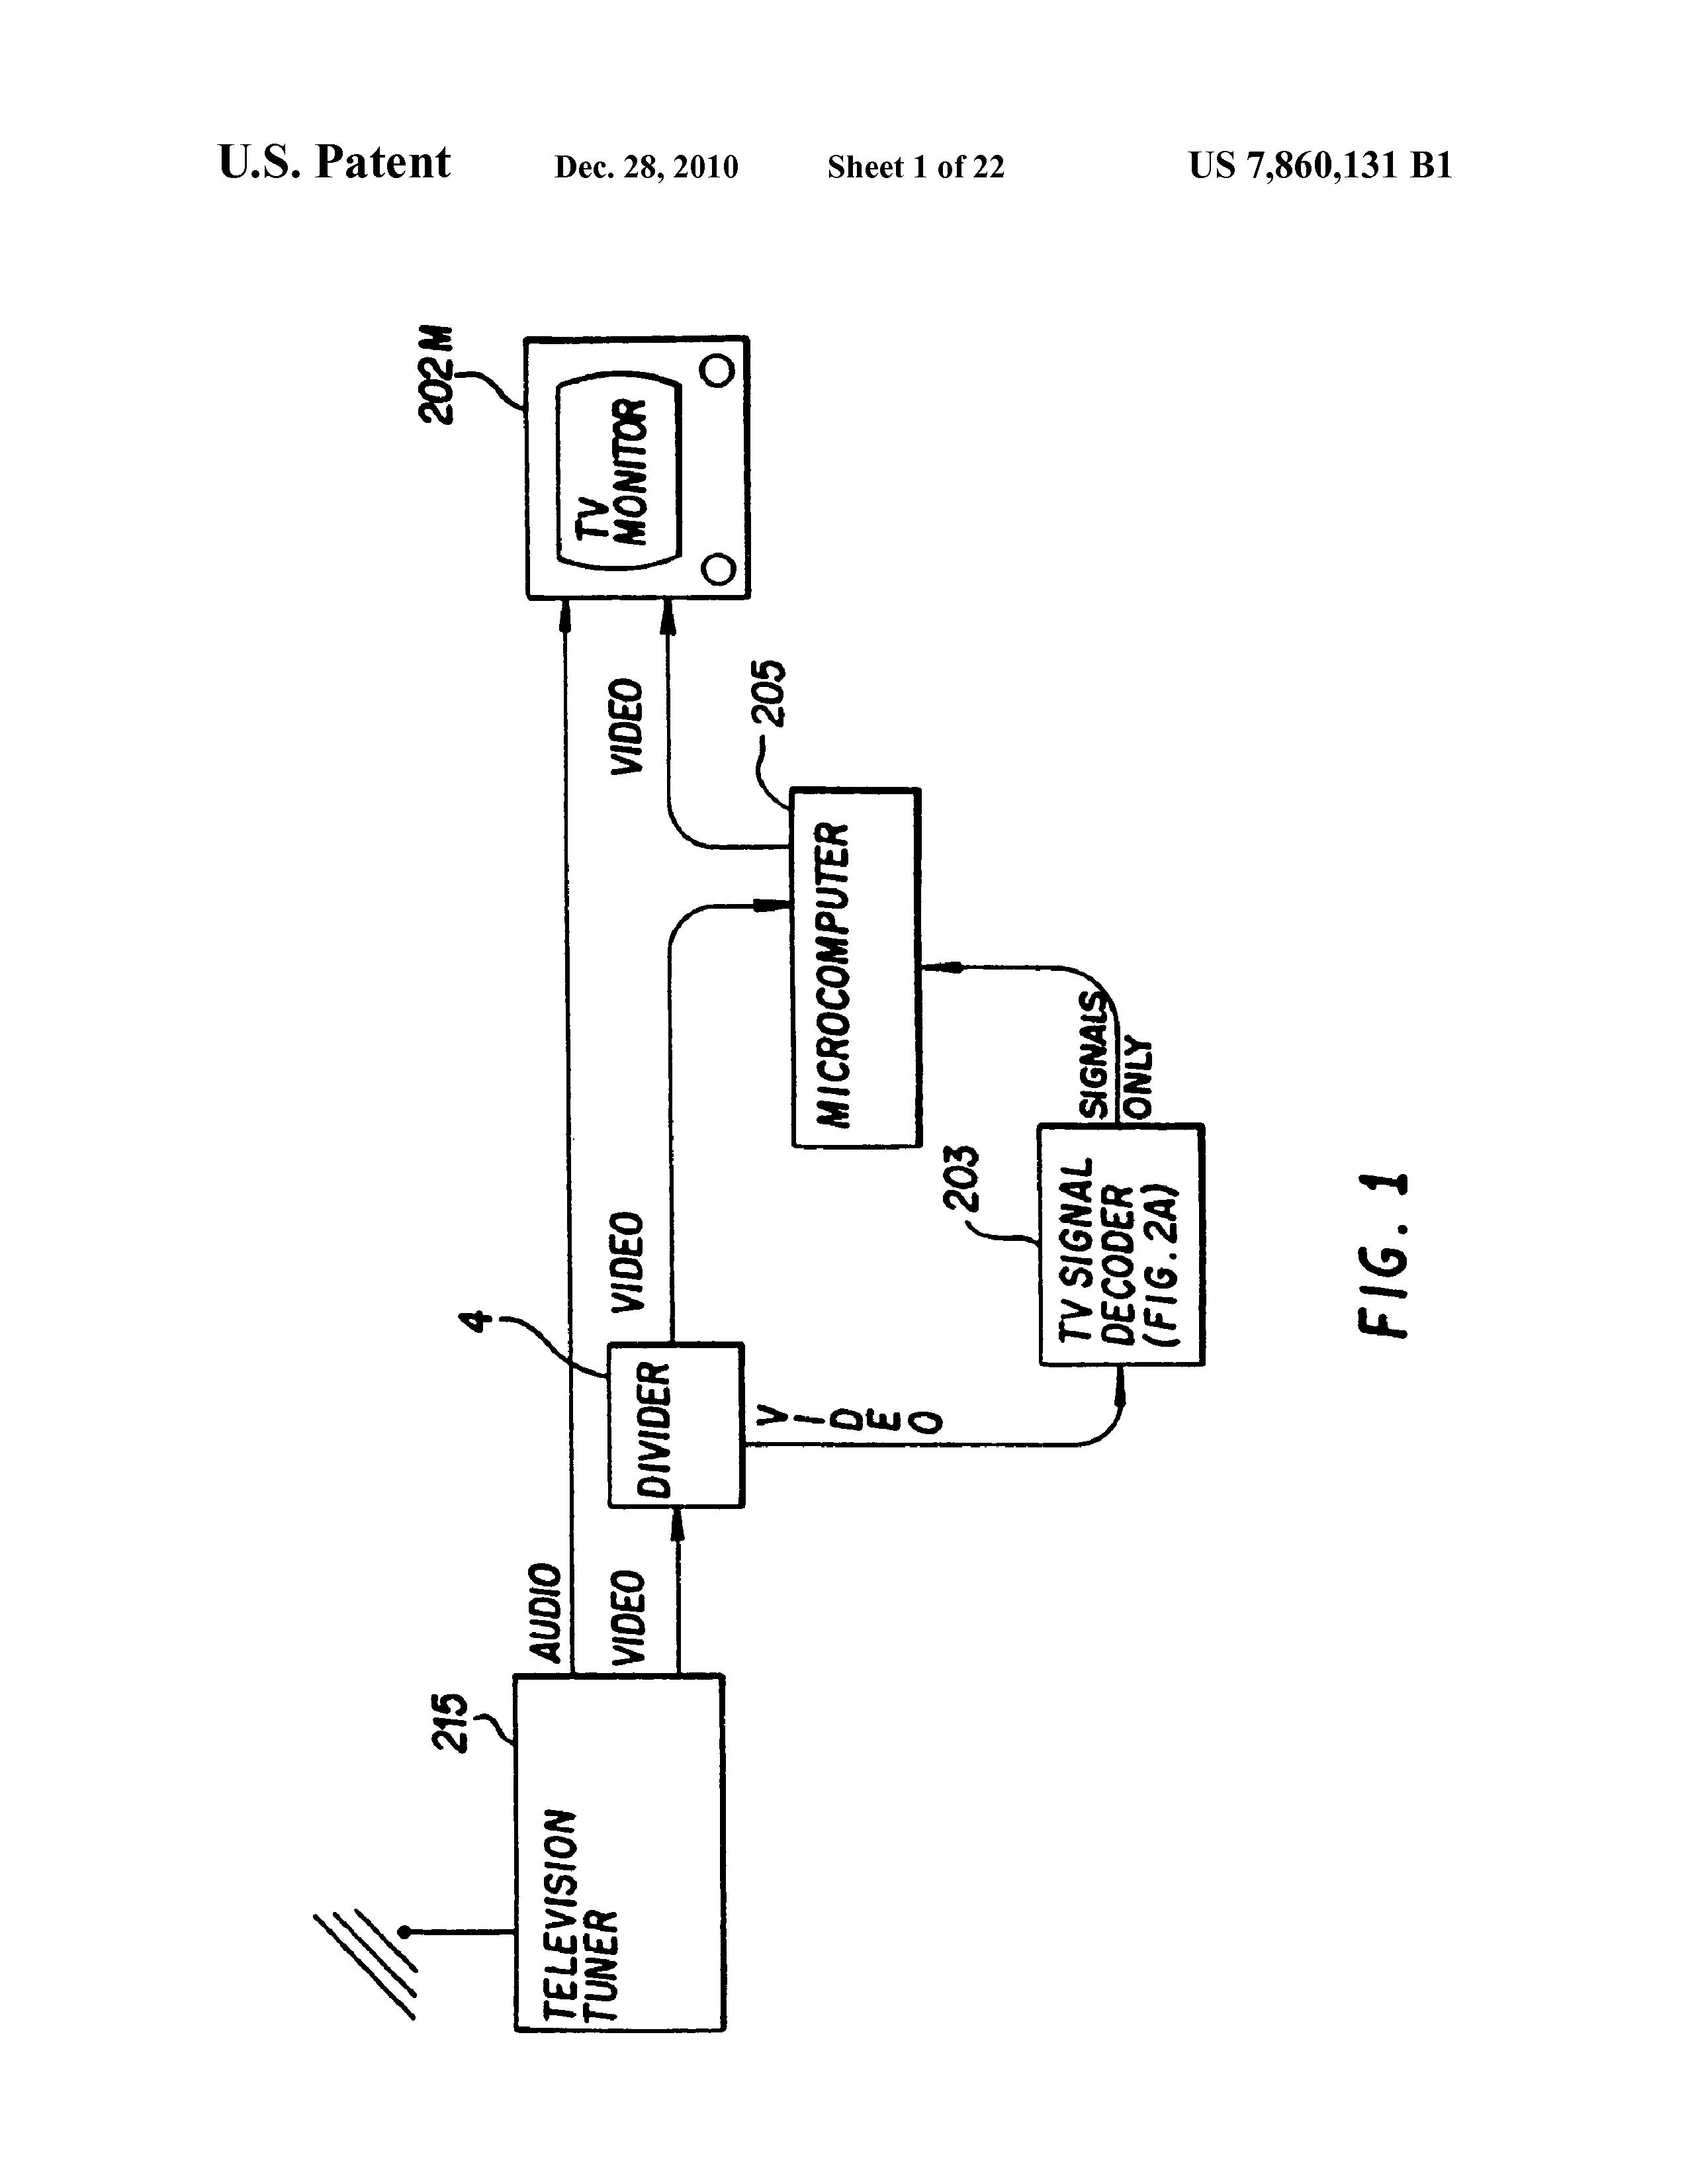 us7860131b1 signal processing apparatus and methods google patents